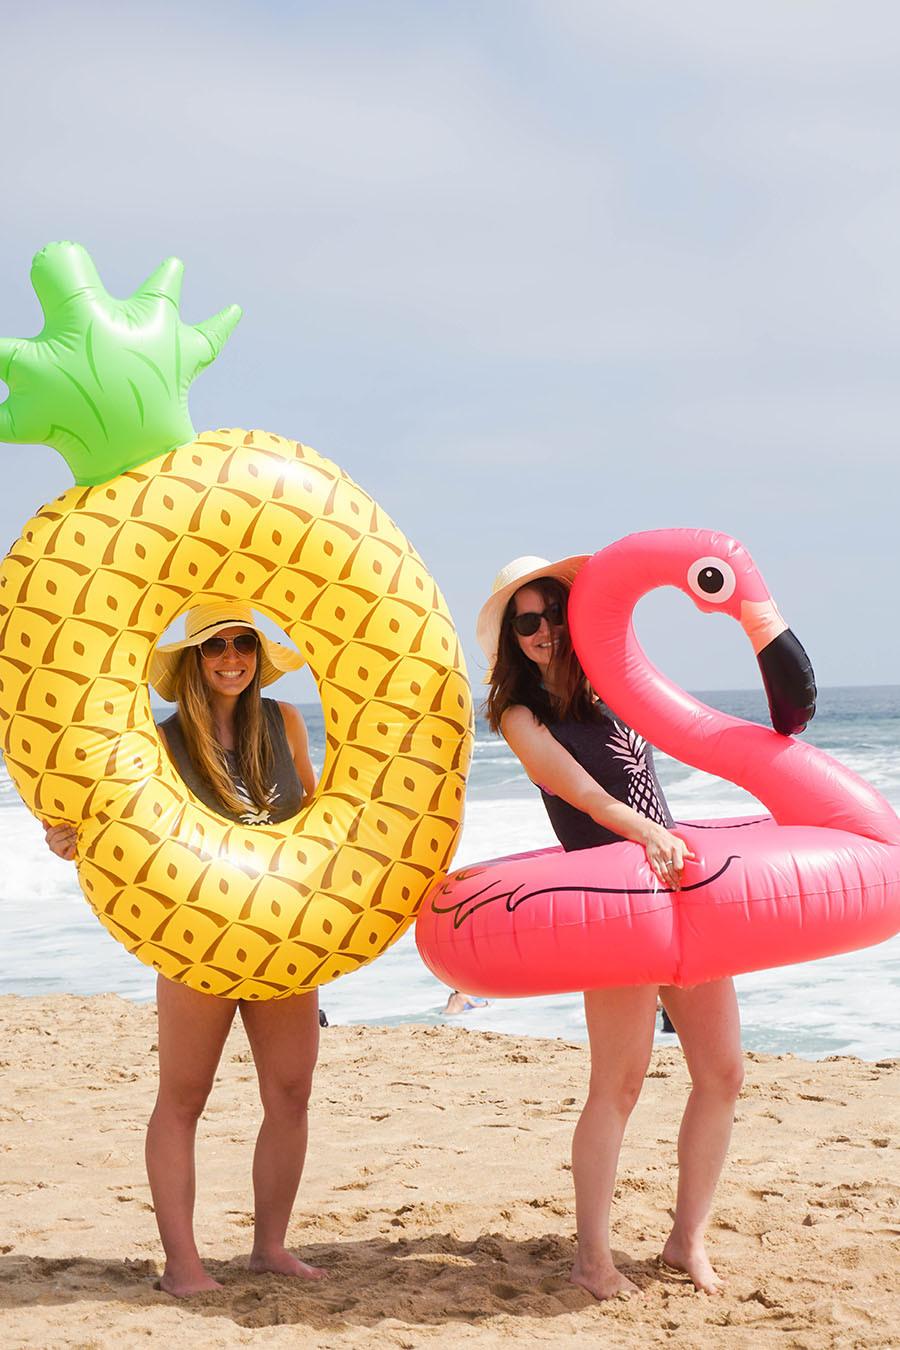 Bachelorette Party Beach Ideas  A Tropical Beach Bachelorette Party